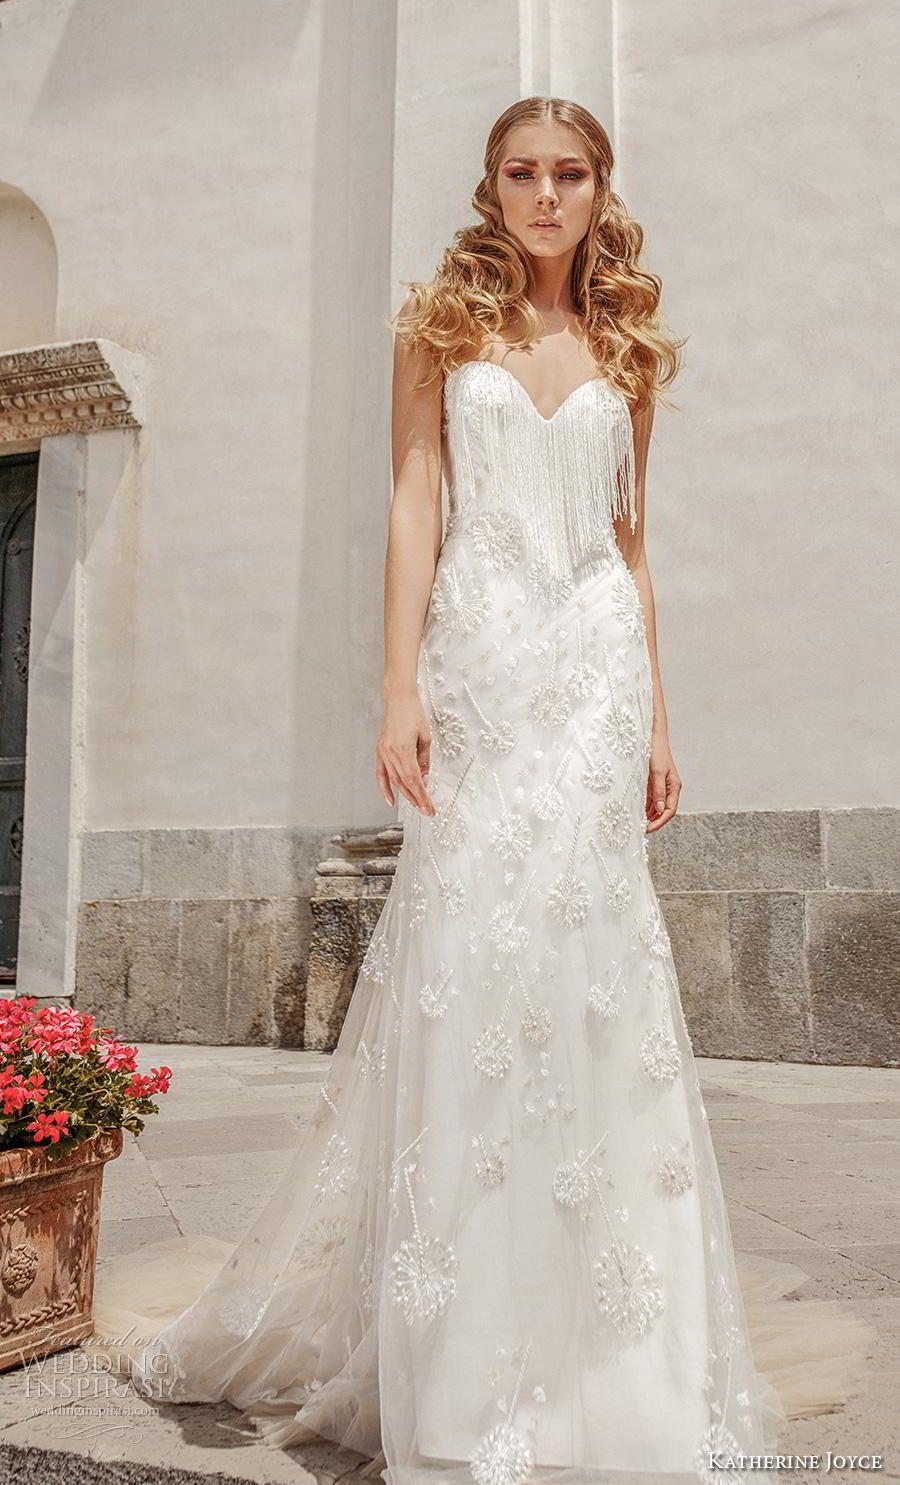 Ball gown wedding dress with bling  Katherine Joyce  Wedding Dresses u ucNapoliud Bridal Collection